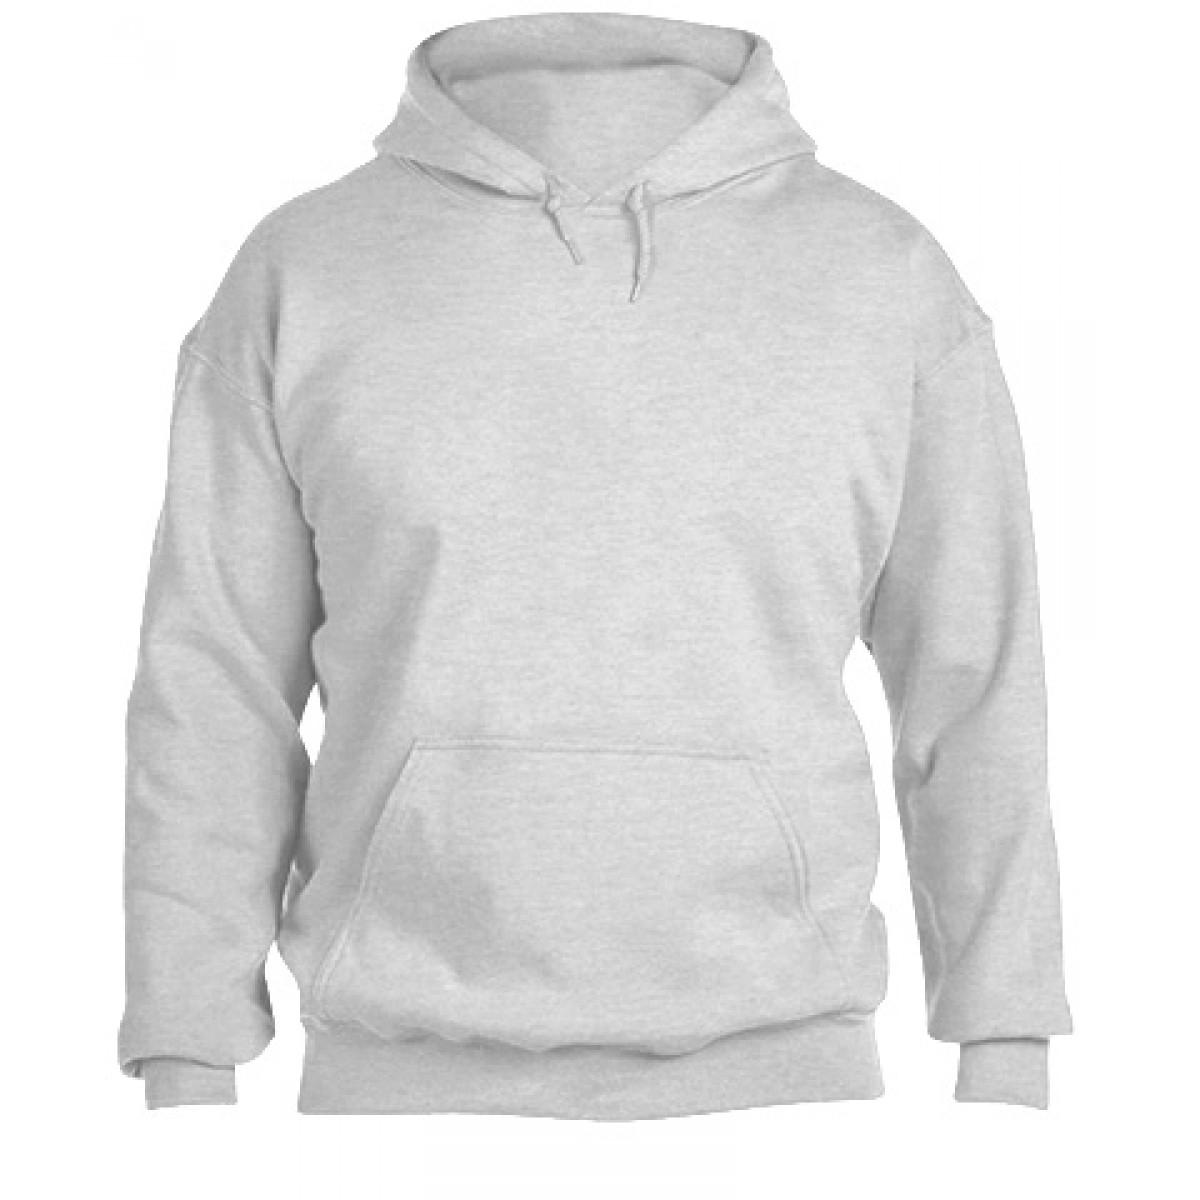 Solid Hooded Sweatshirt  50/50 Heavy Blend-Ash Gray-YM